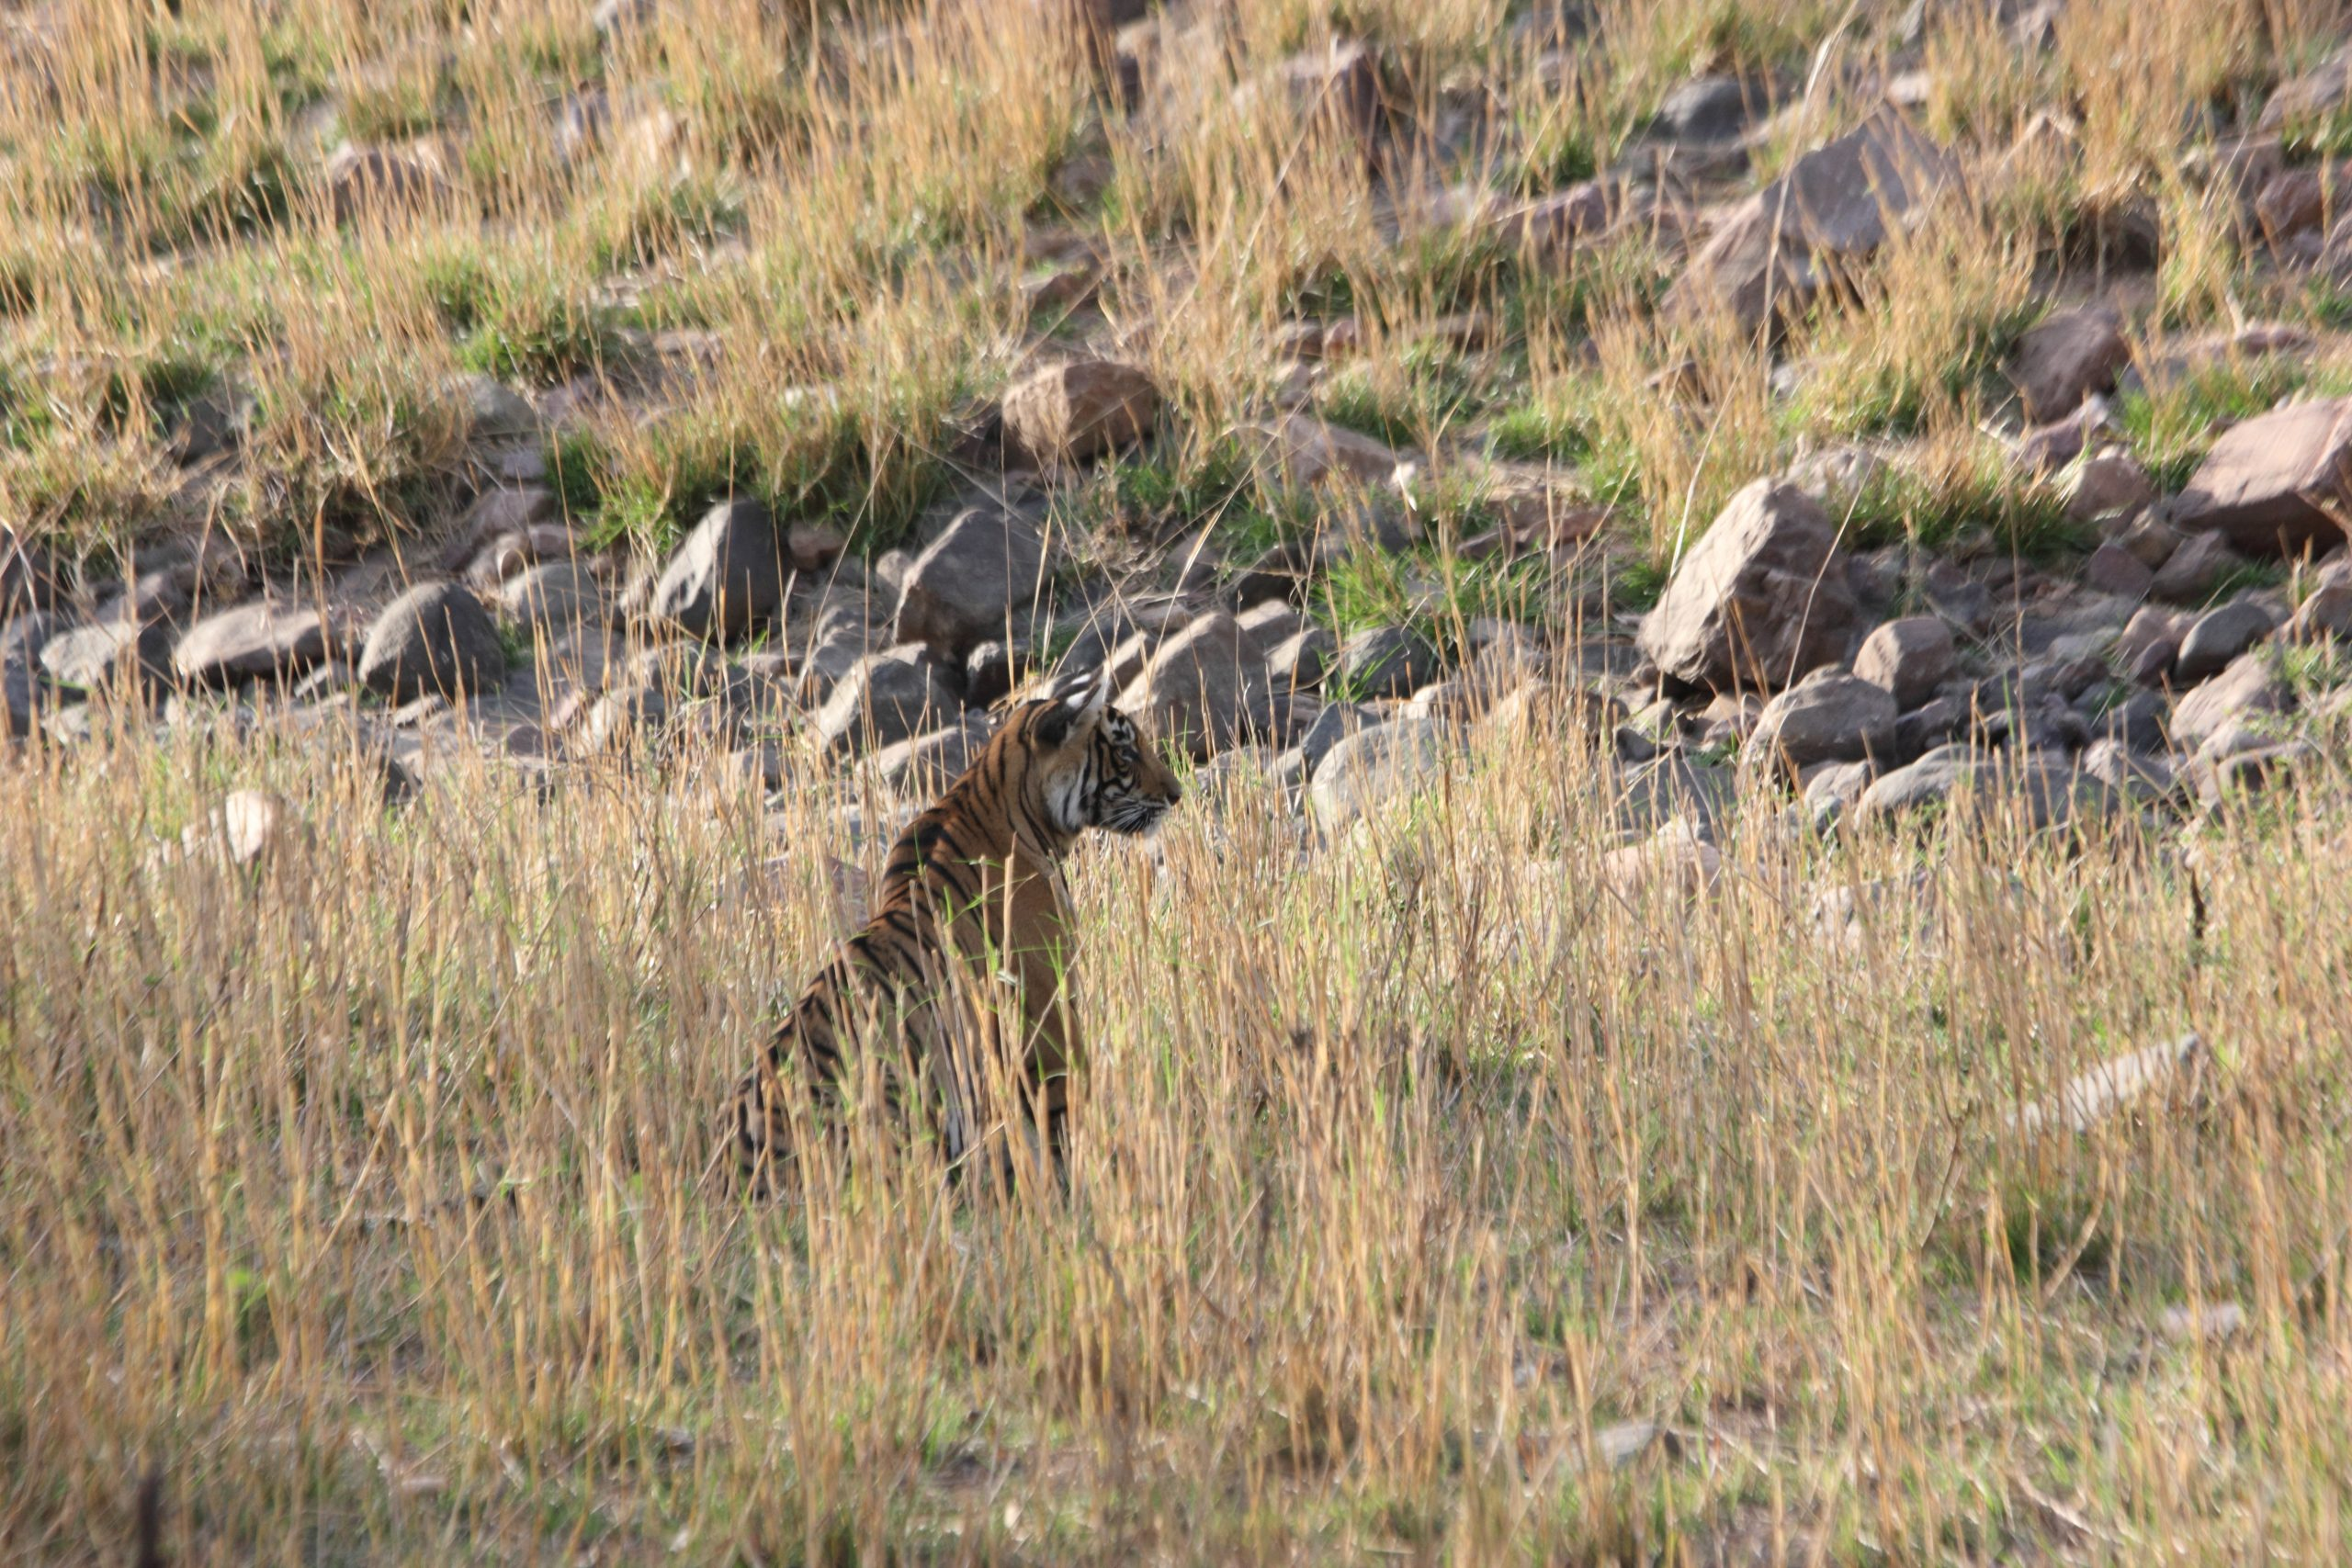 A tiger in jungle